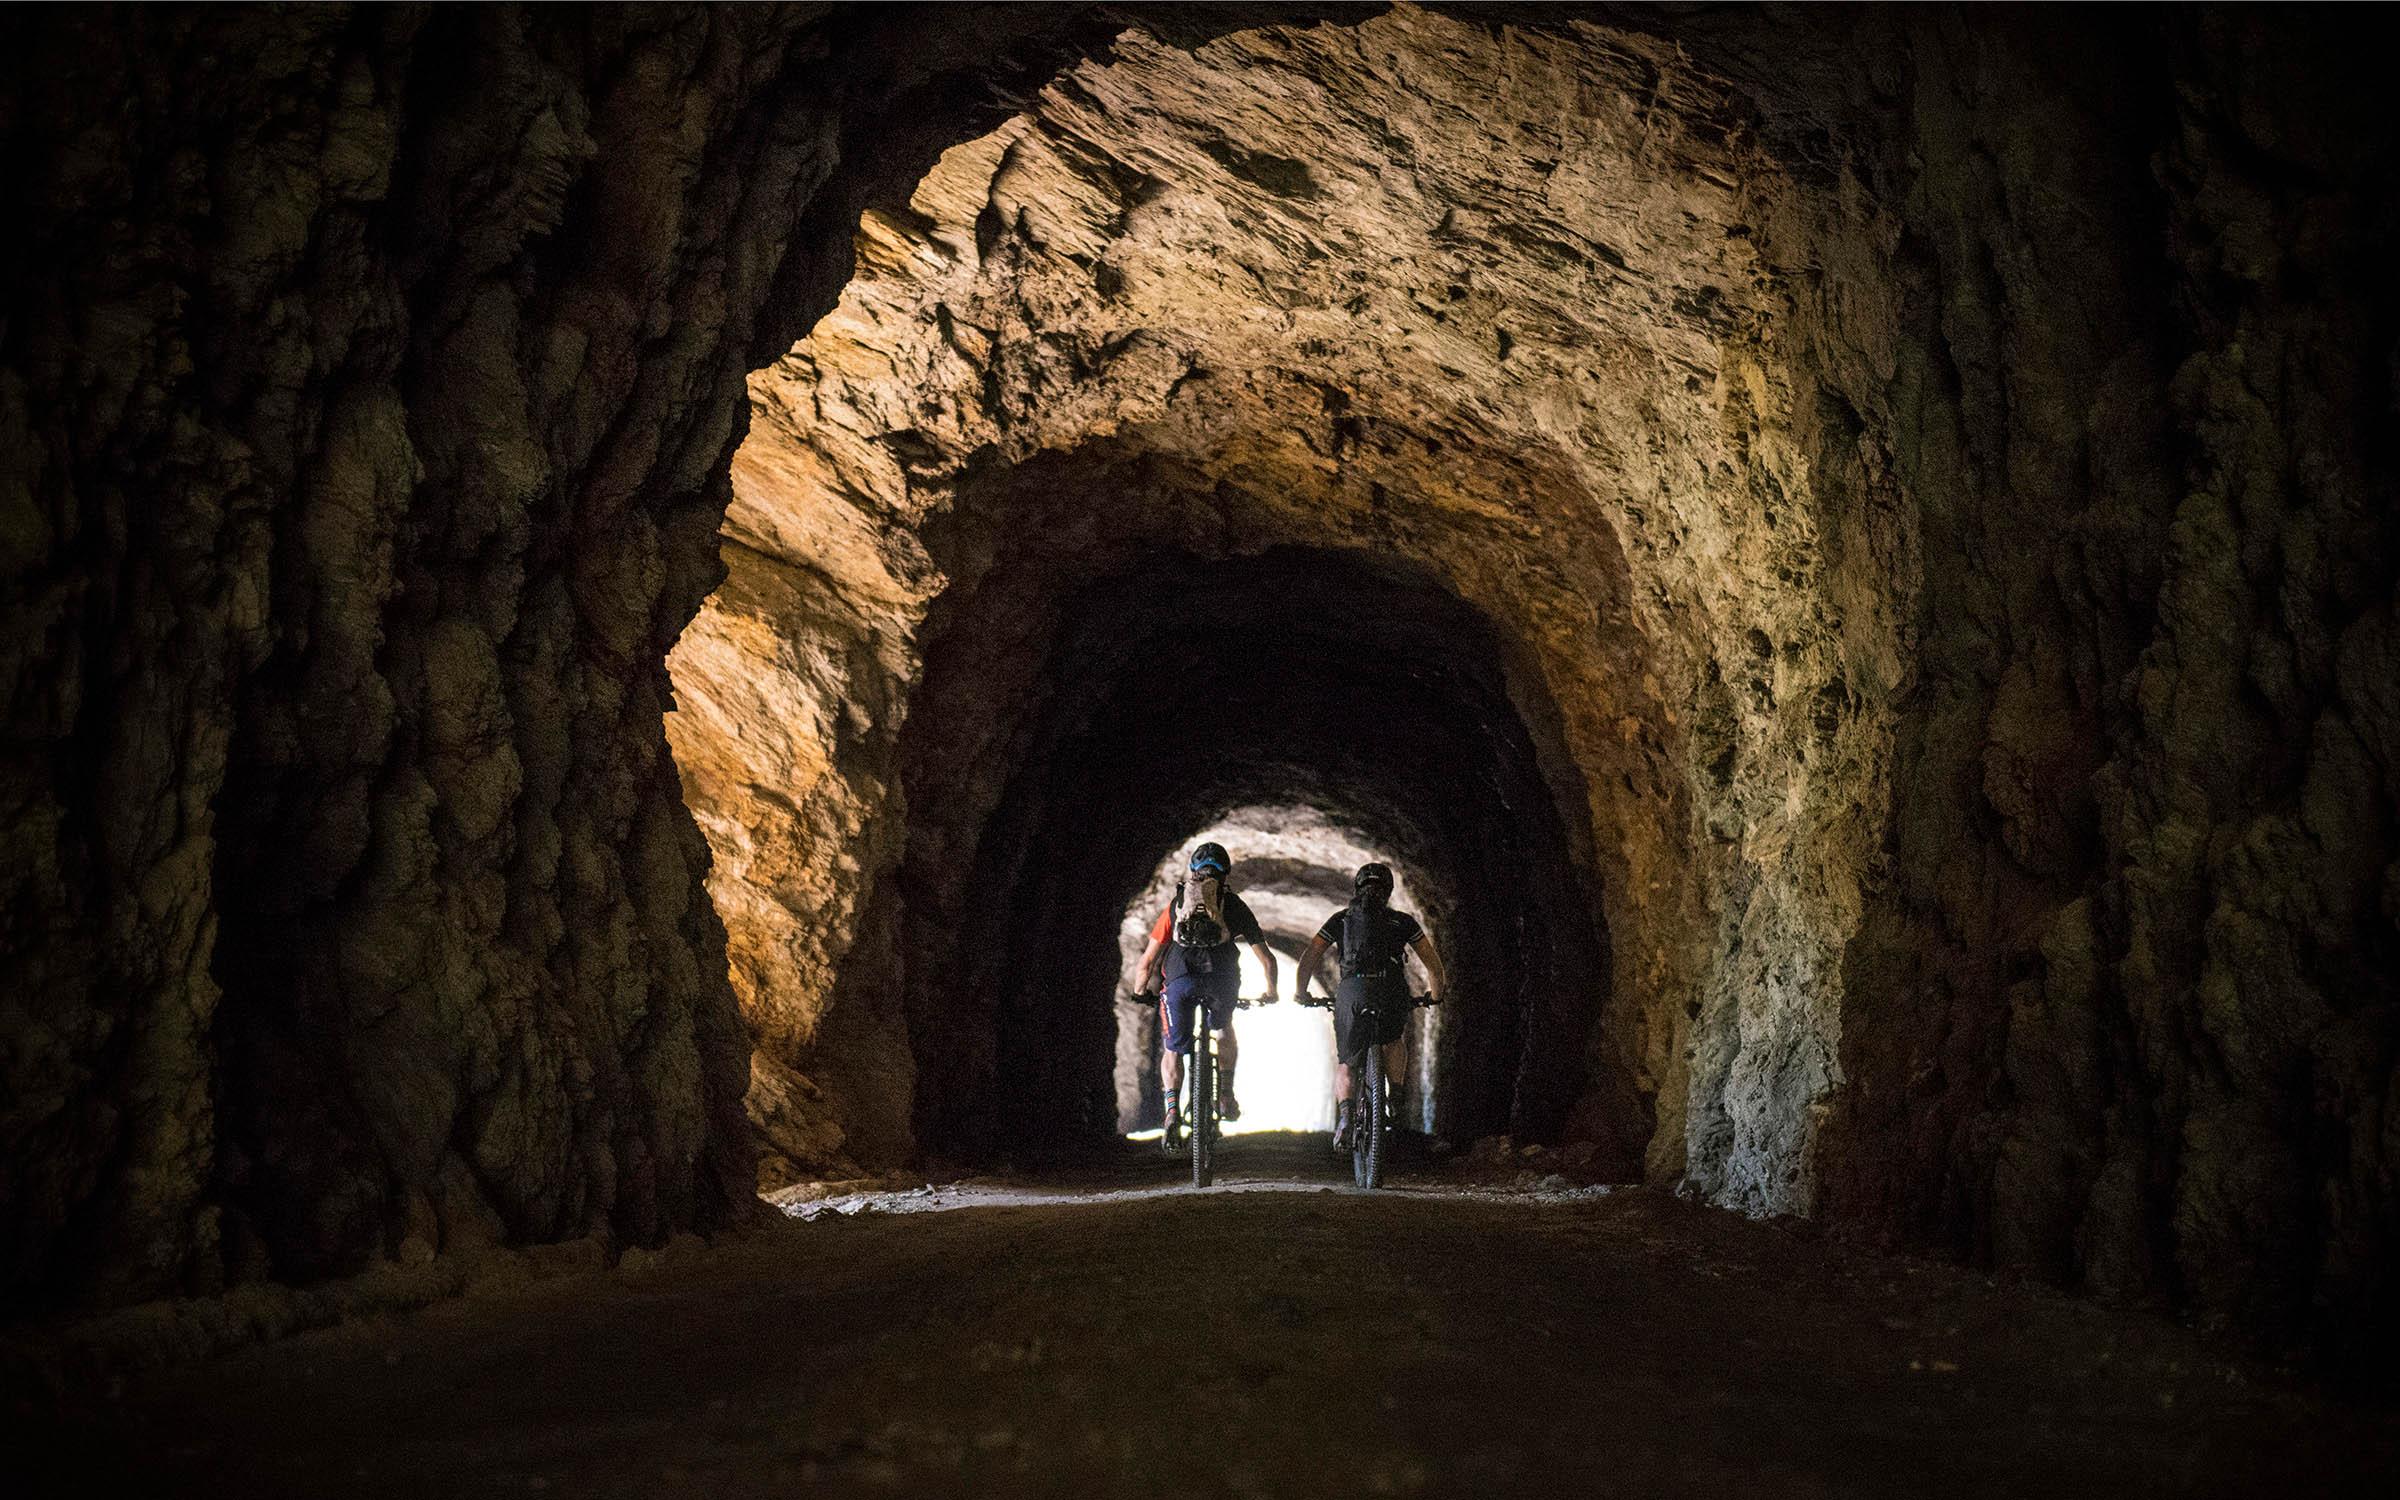 De Brennerkam ligt vol met militaire wegen, ook dóór tunnels